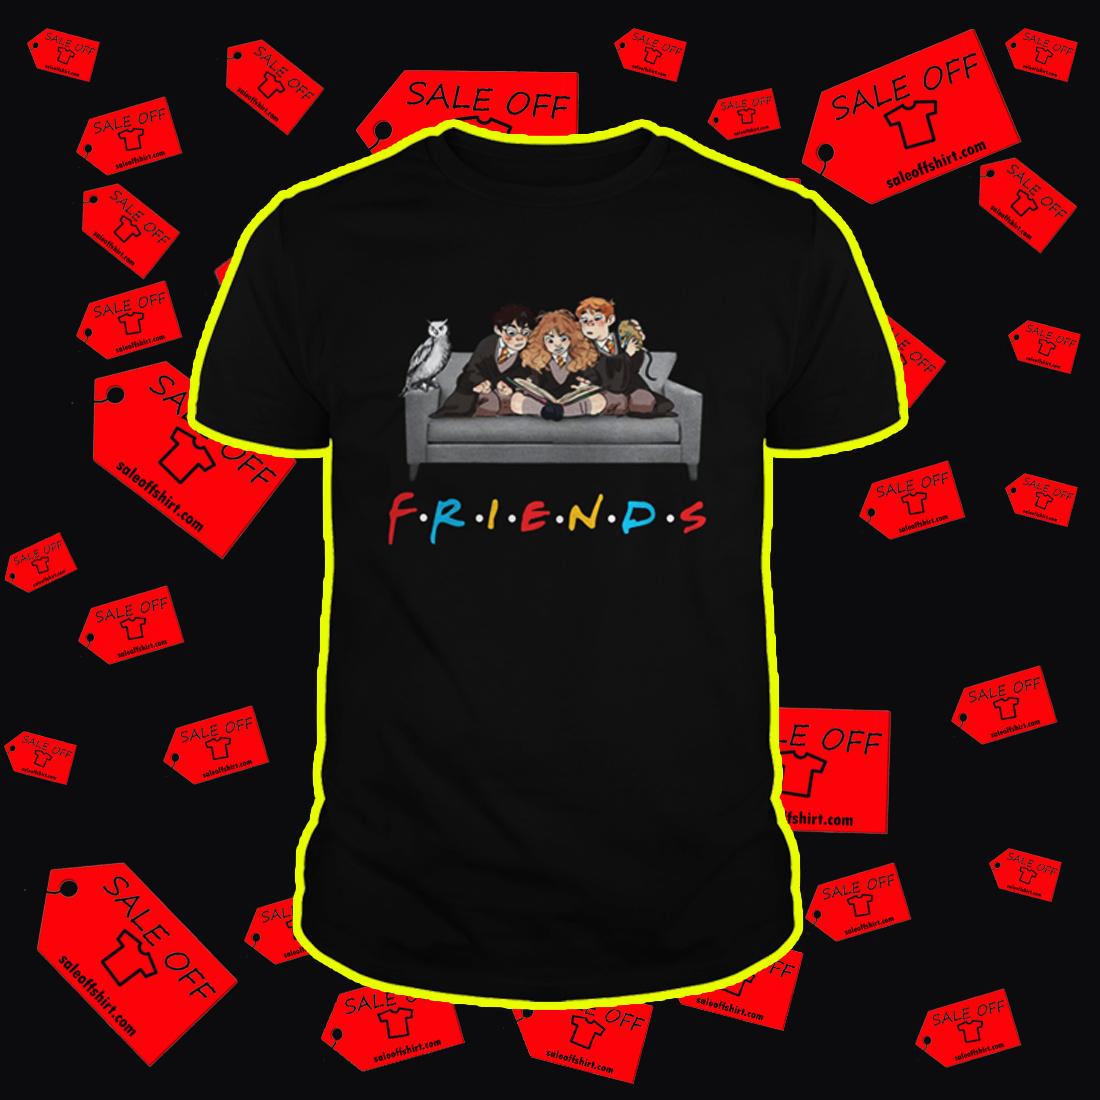 Harry Potter friends TV show shirt - style 2